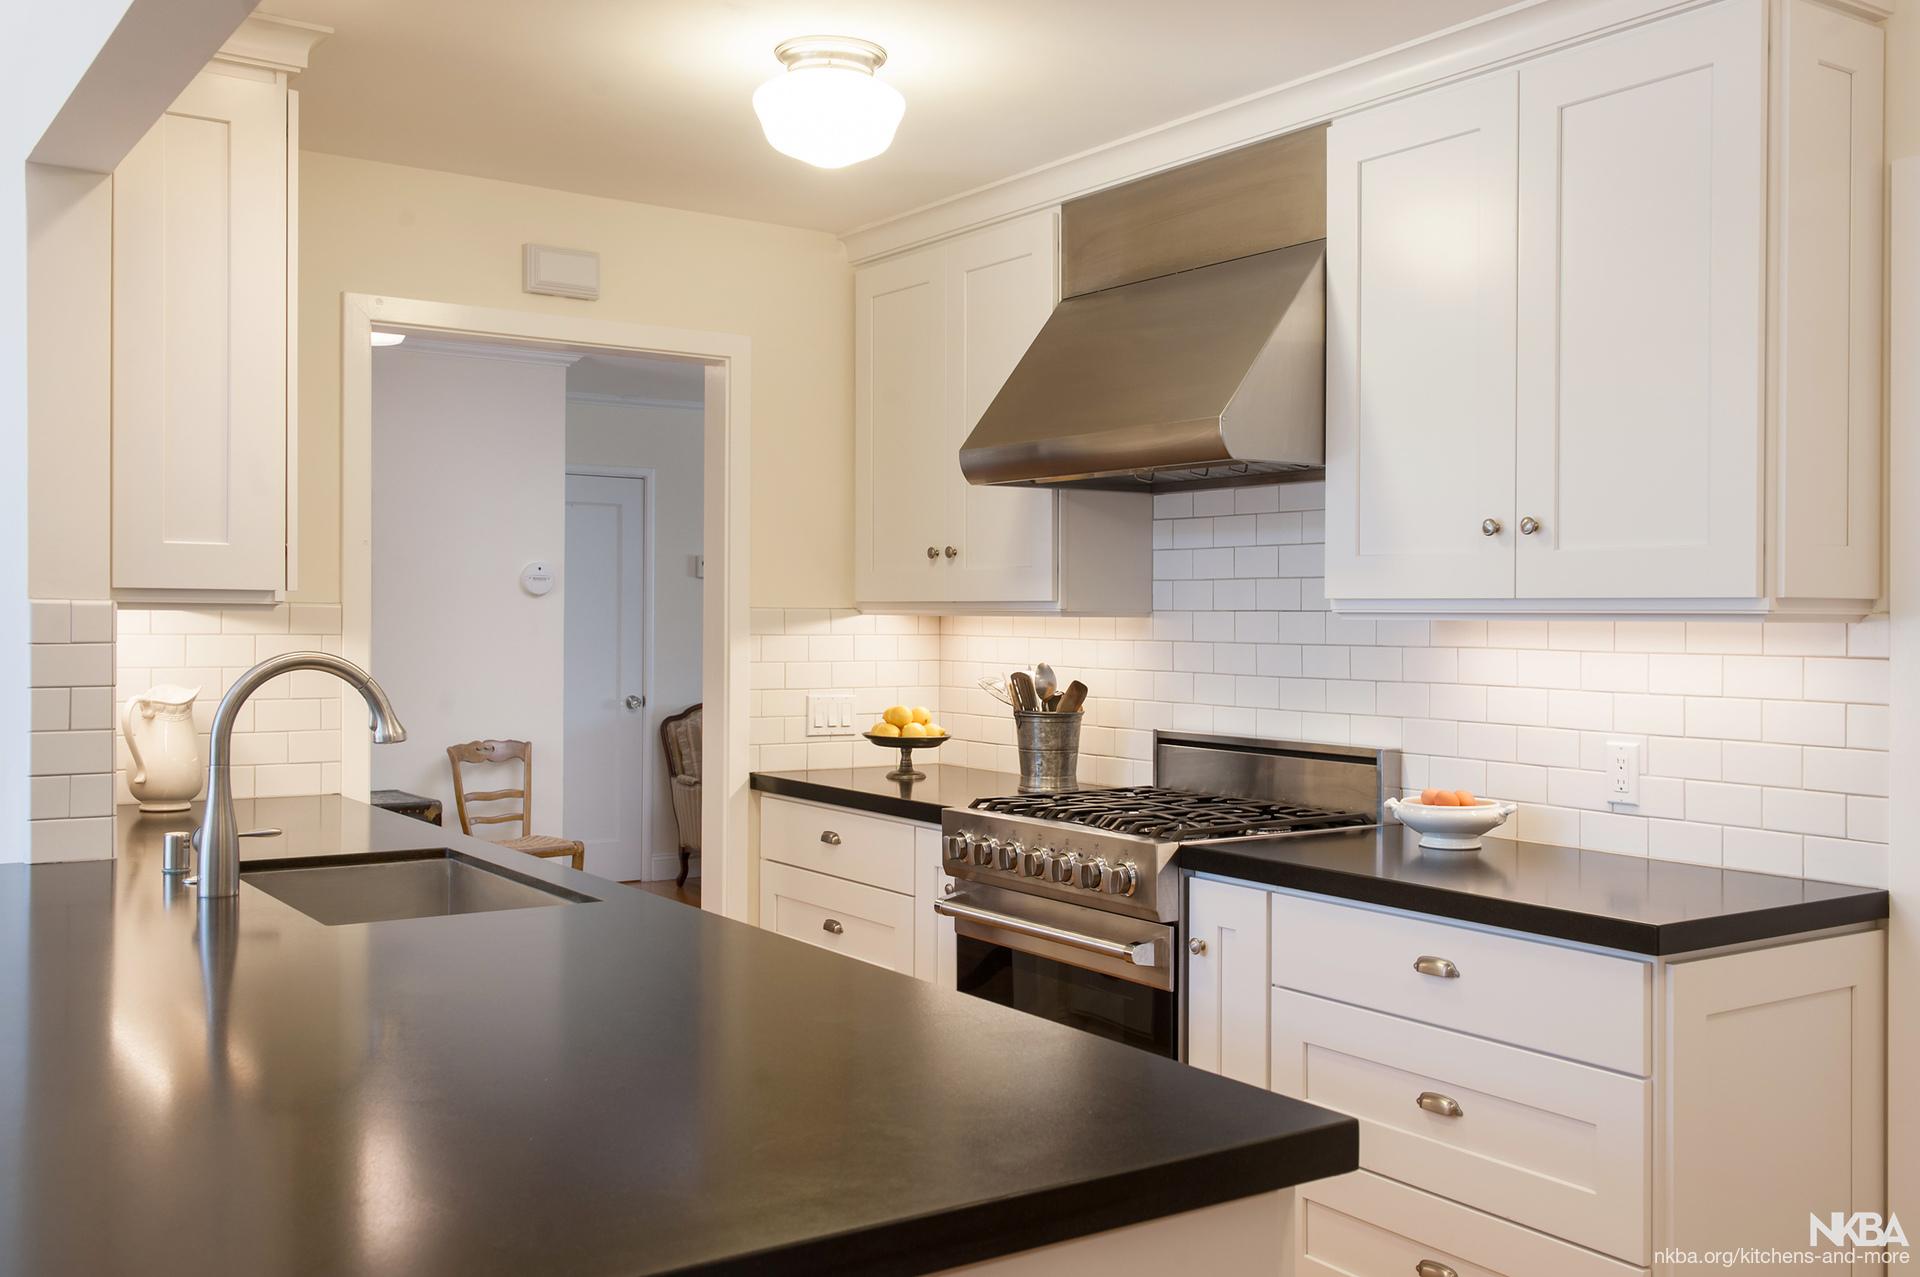 San Rafael Kitchen - NKBA